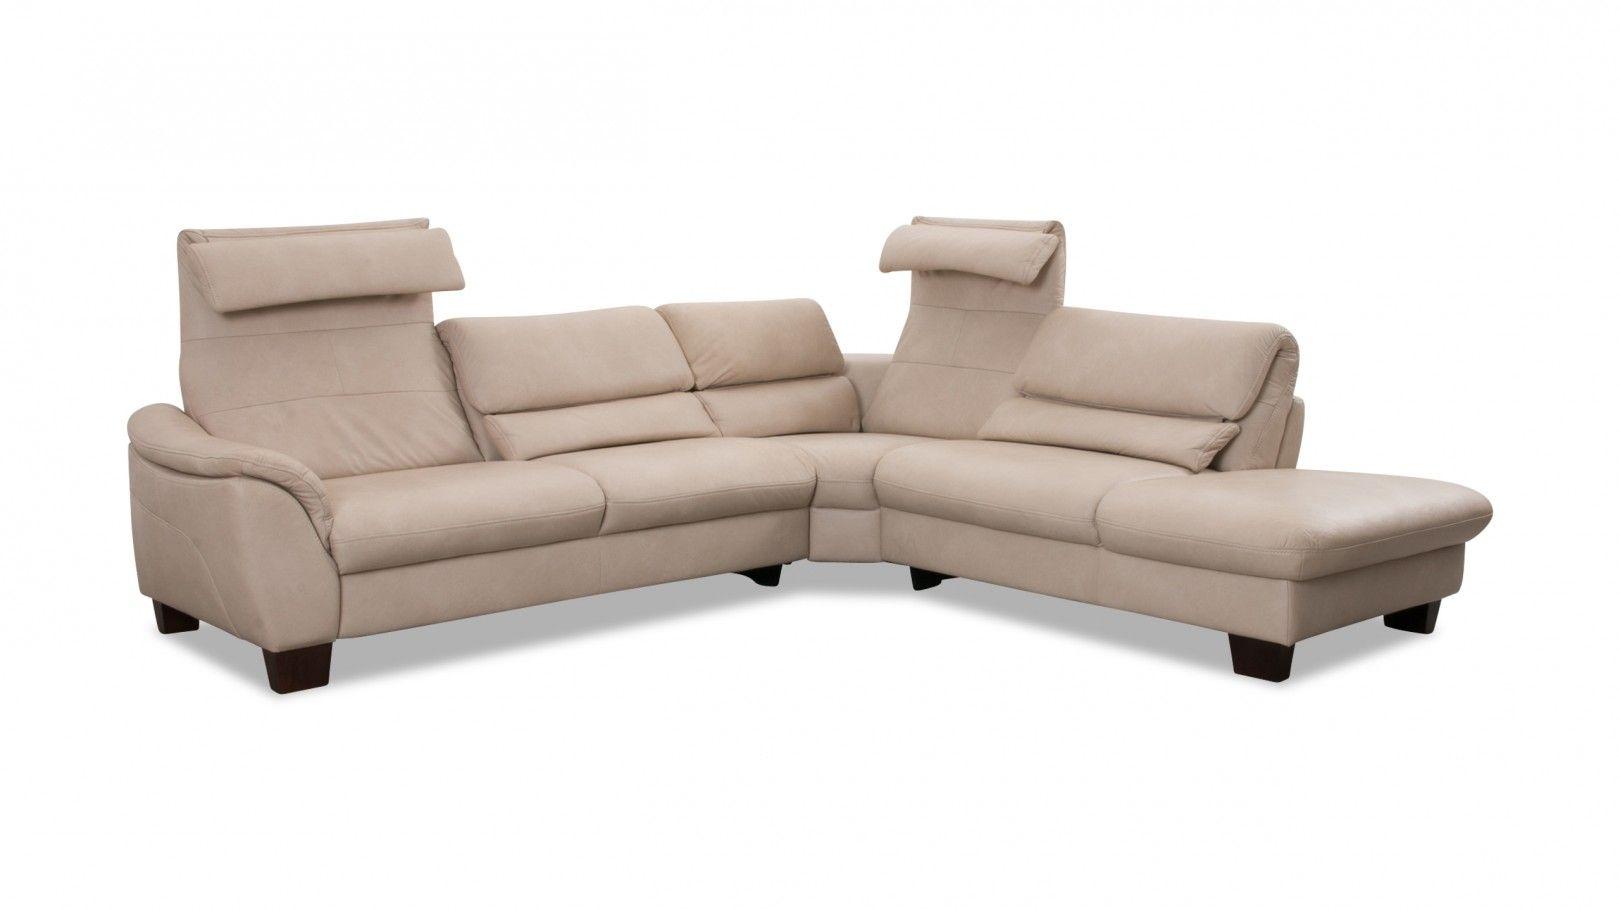 Sitzdesign Markenmobel In 2020 Ecksofa Sofa Outlet Sofa